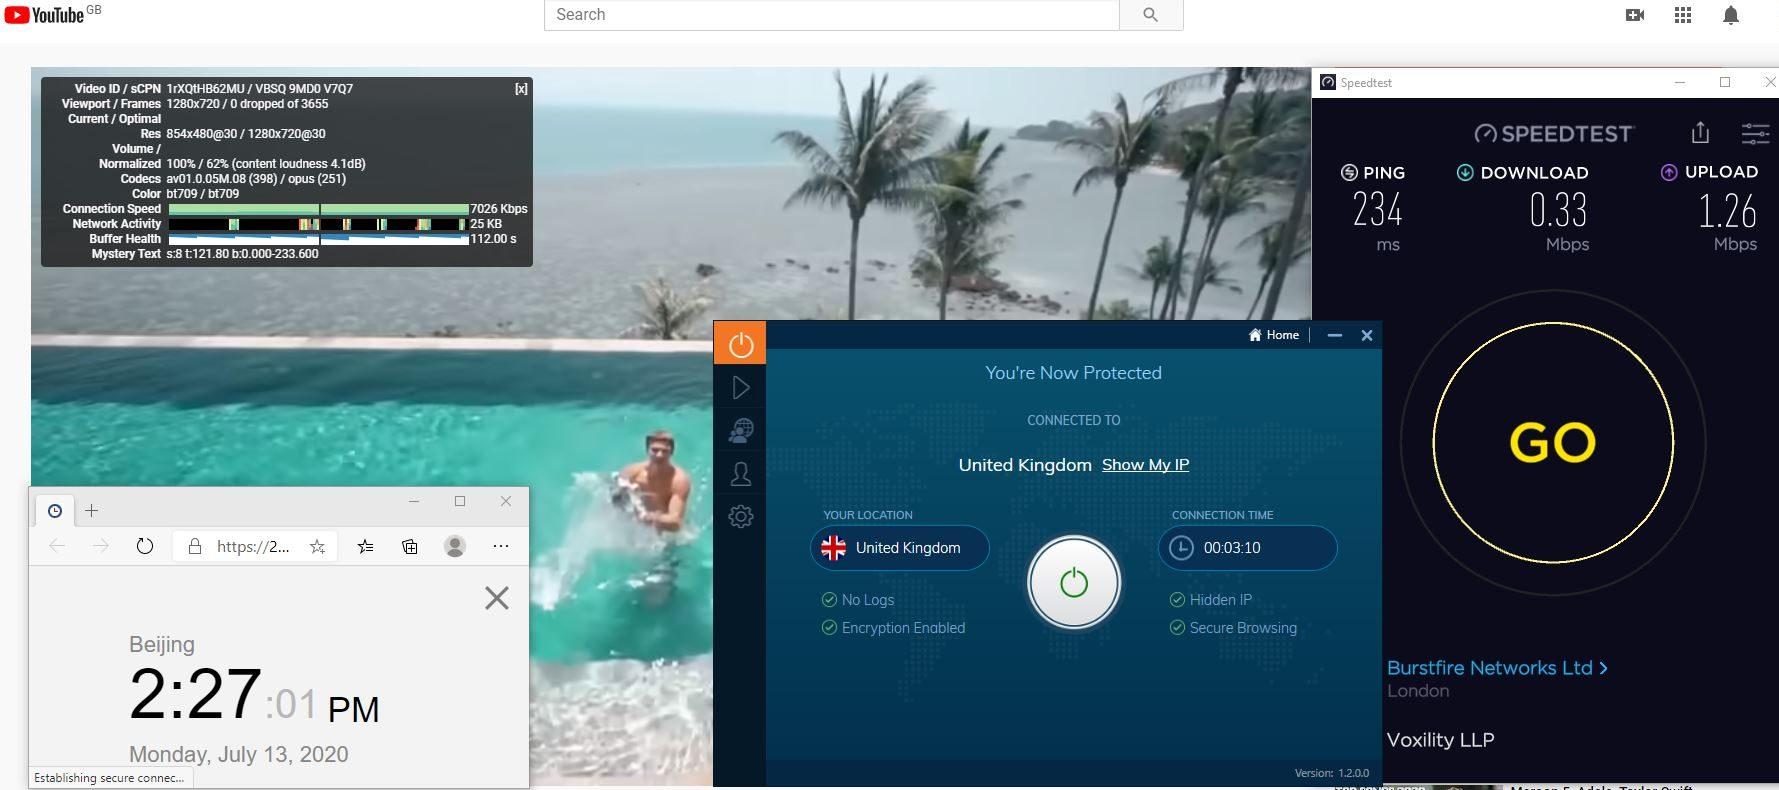 Windows10 IvacyVPN UK 中国VPN 翻墙 科学上网 测速-20200713